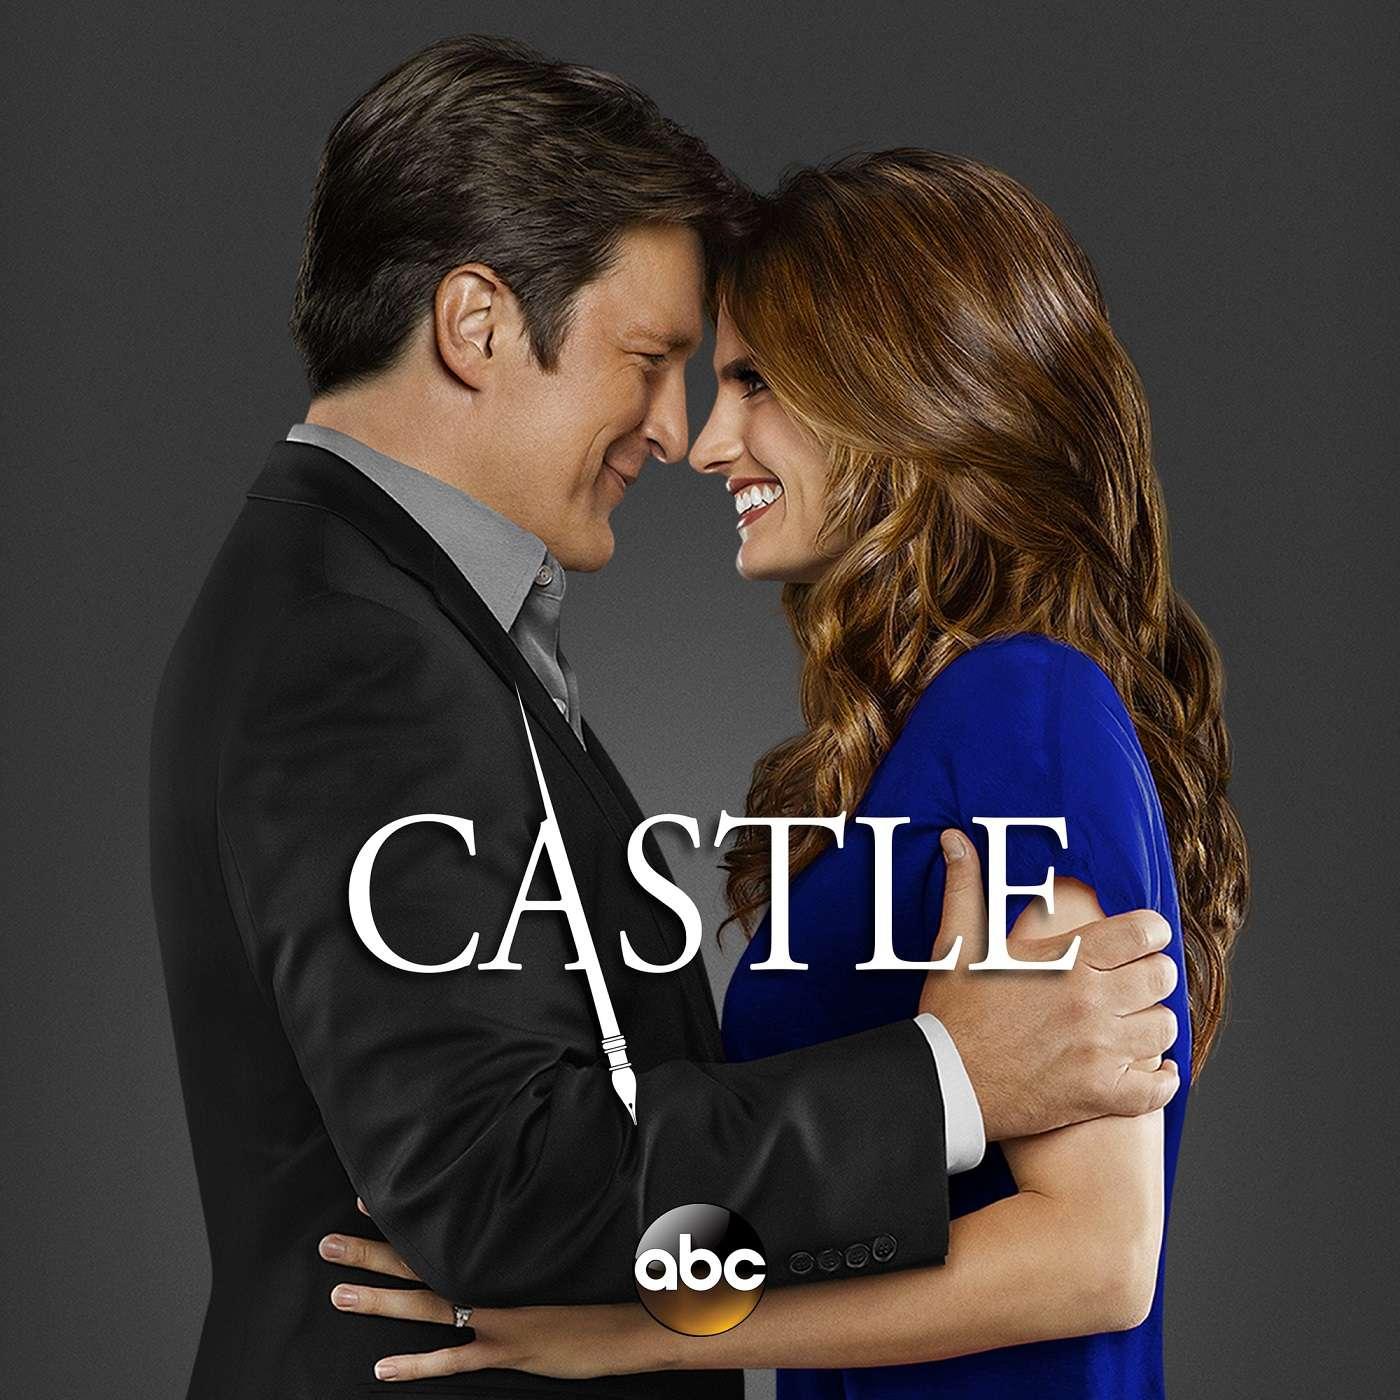 Castle S07 720p 1080p WEBDL | S07E01-E23